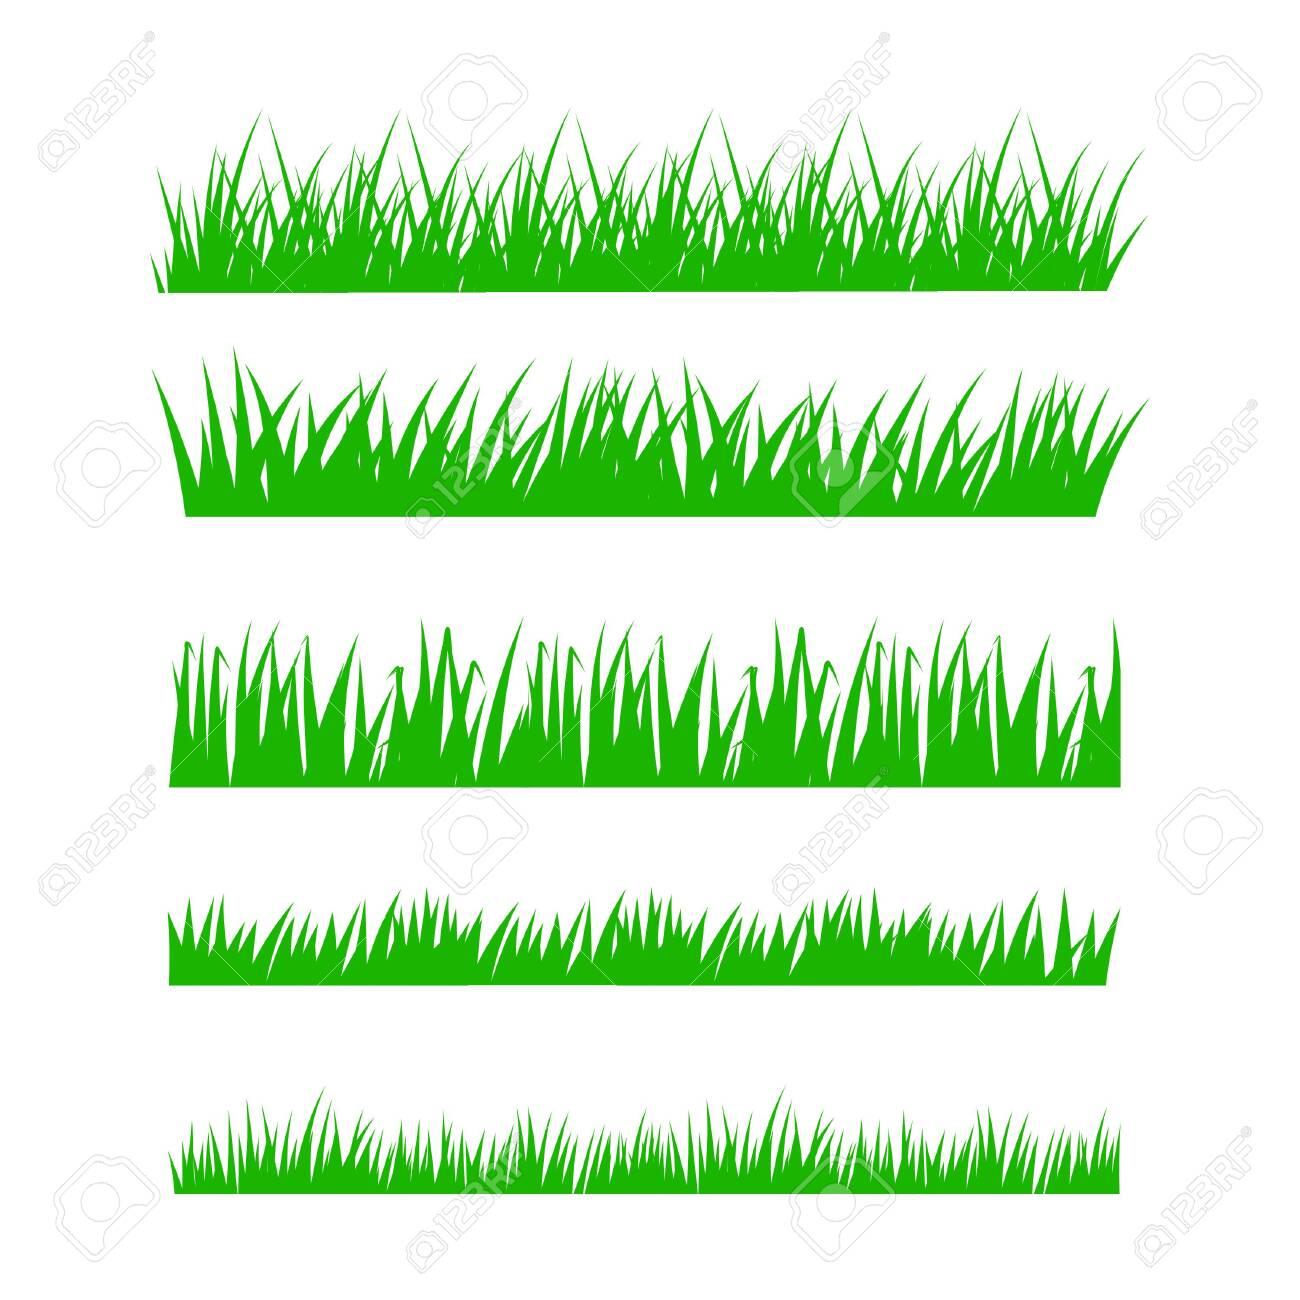 Set of green grass on white background. Vector illustration. - 138088226